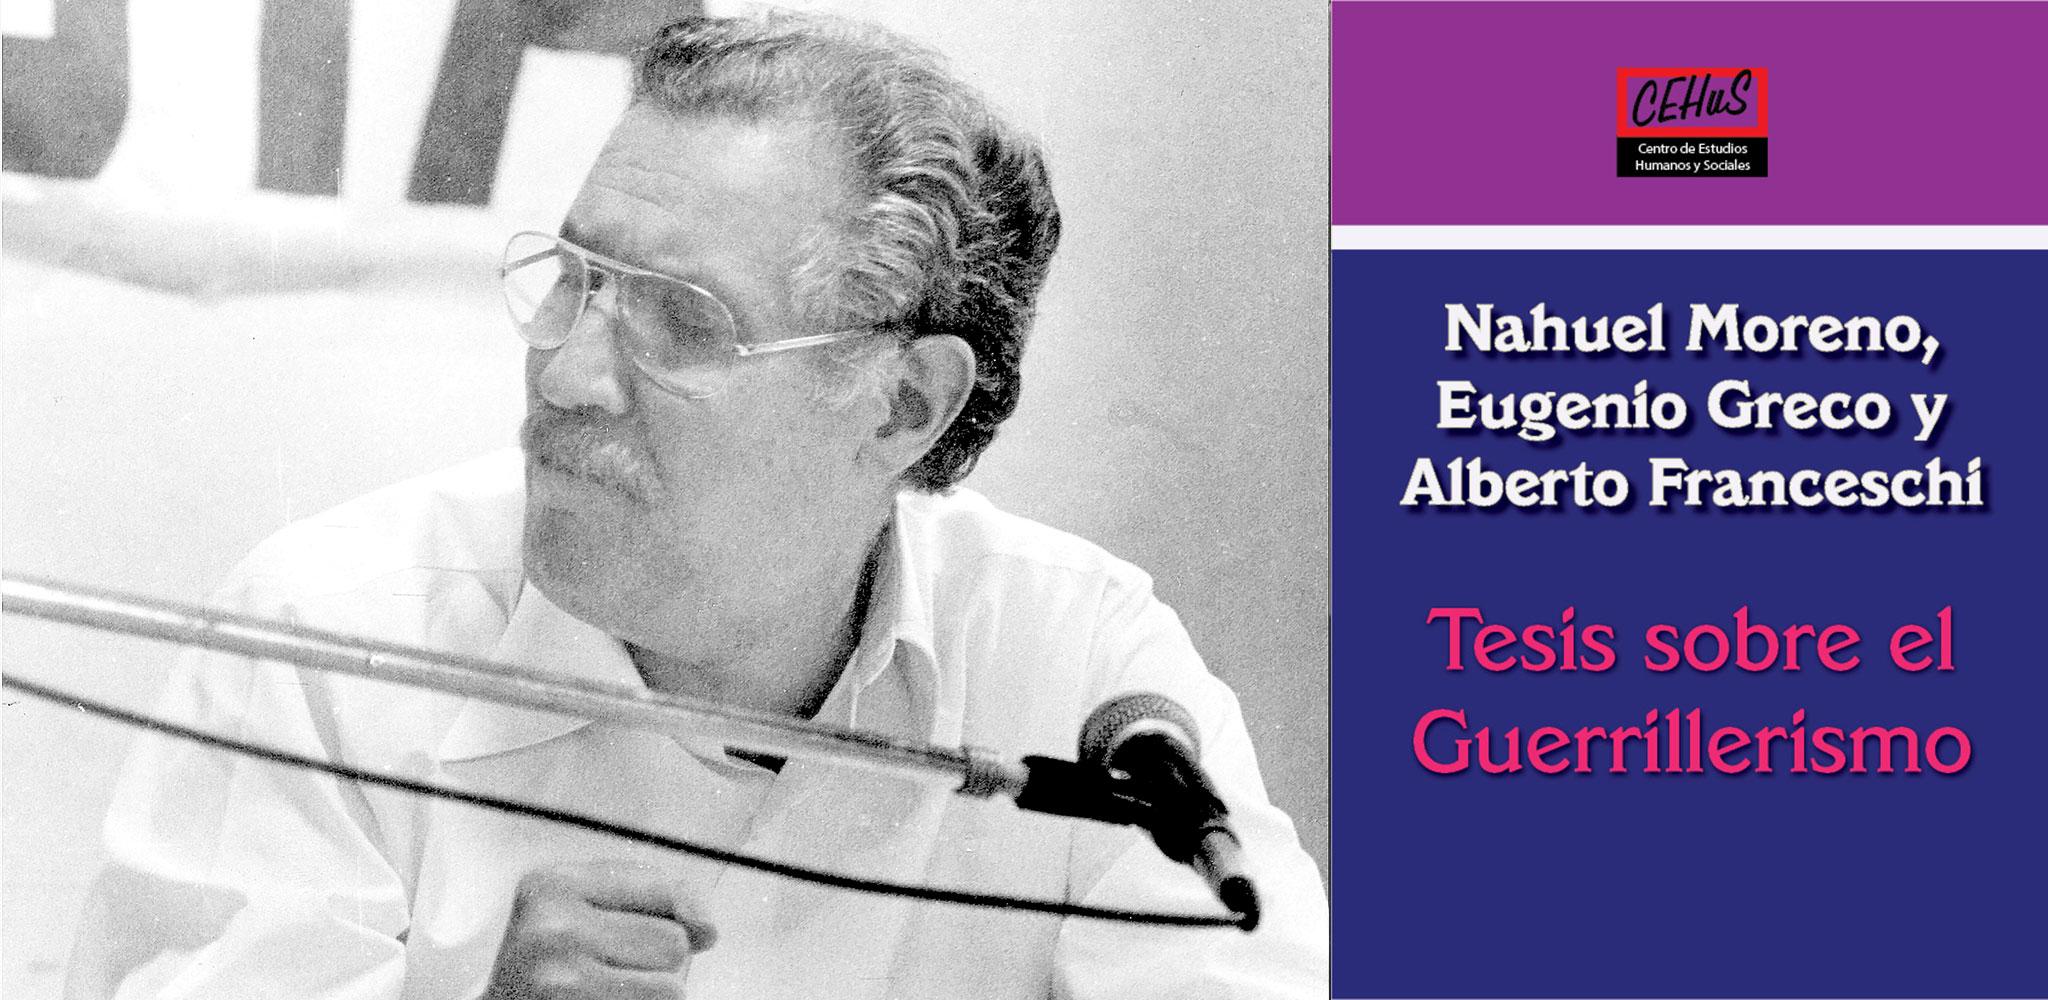 TESIS SOBRE EL GUERRILLERISMO (1986)